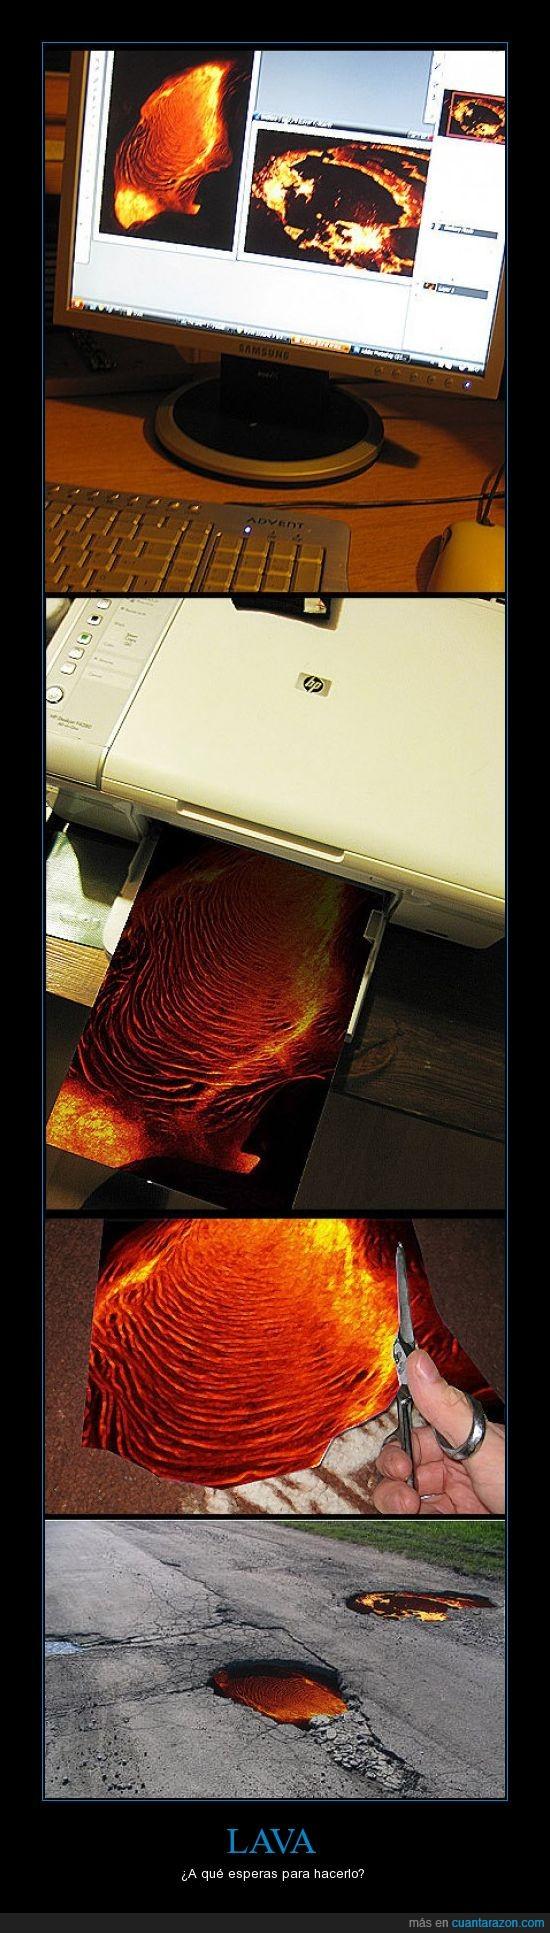 carretera,impresora,imprimir,lava,suelo,troll